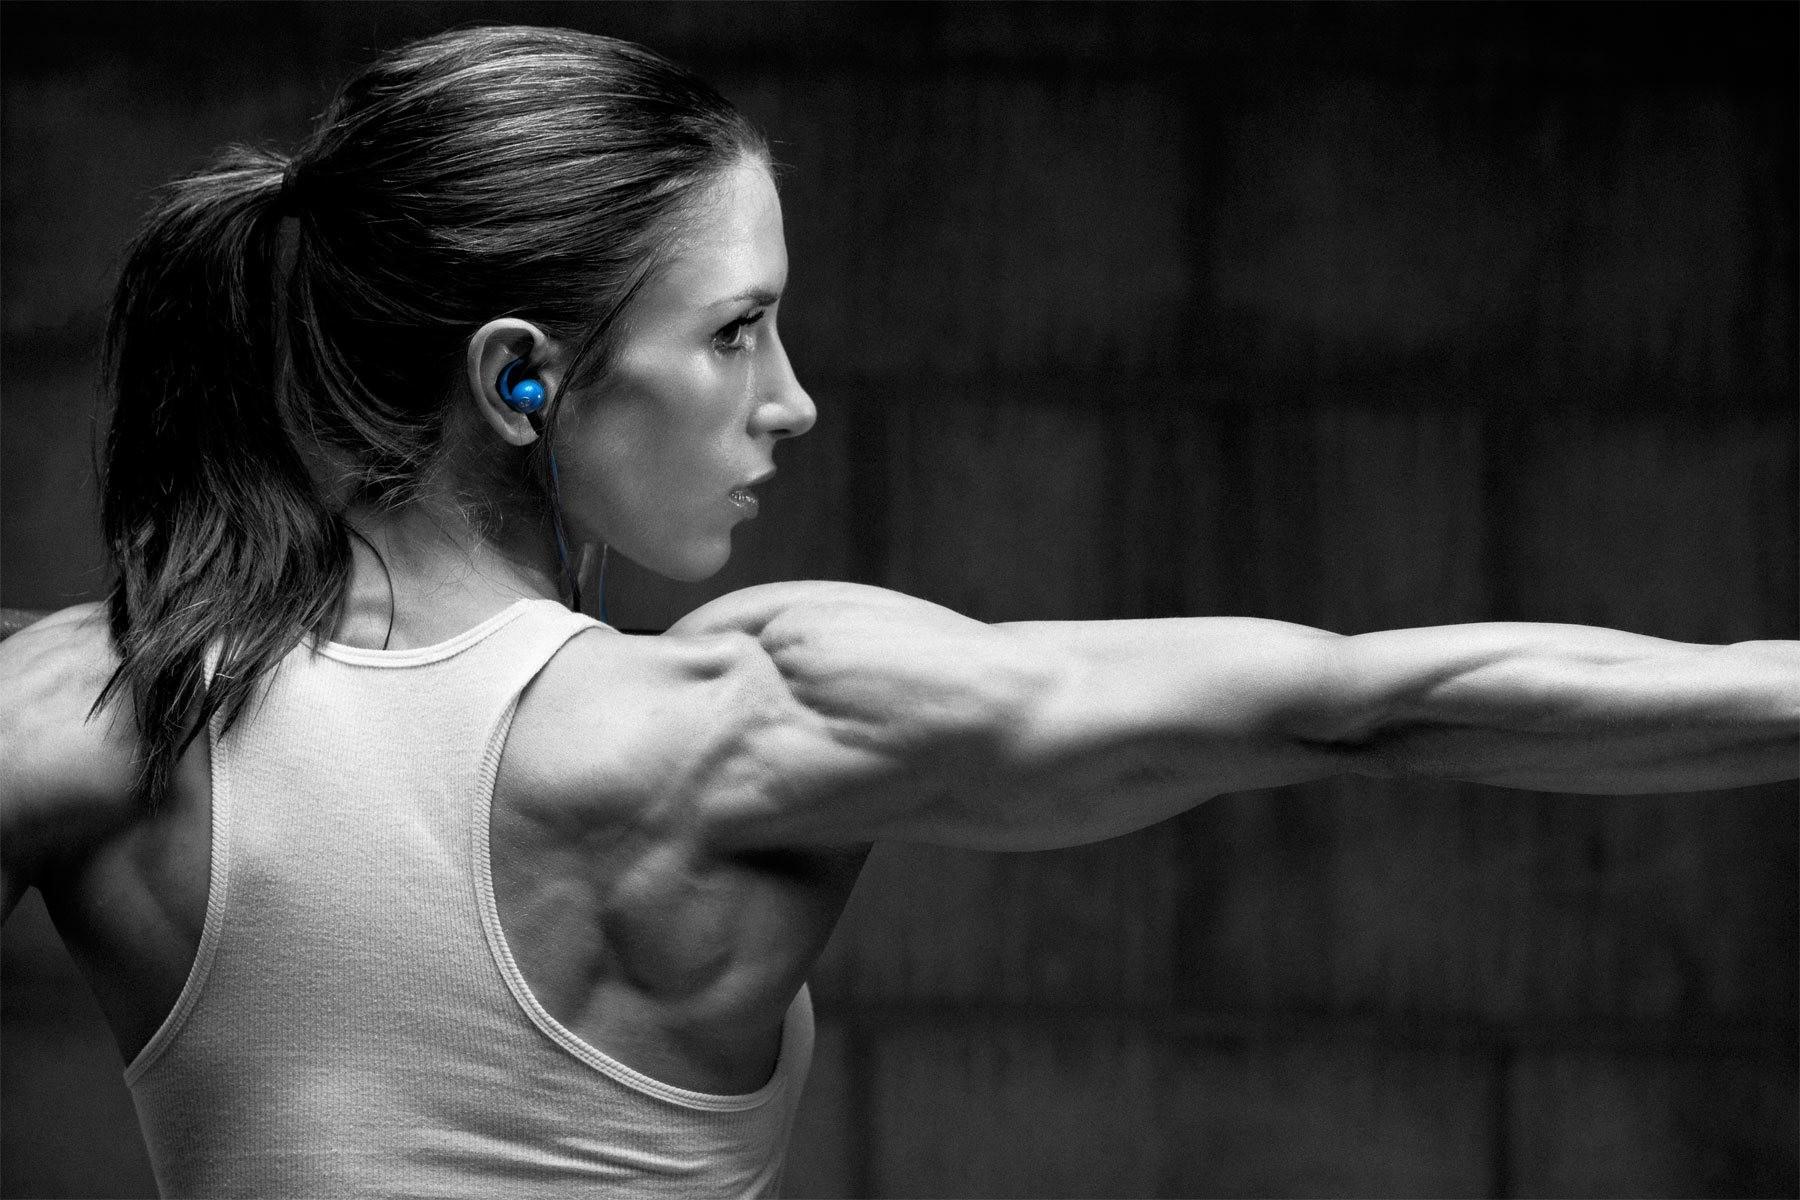 Wallpaper : blue, fitness model, bodybuilding, barbell, Pauline ... for Bodybuilding Art Photography  575lpg